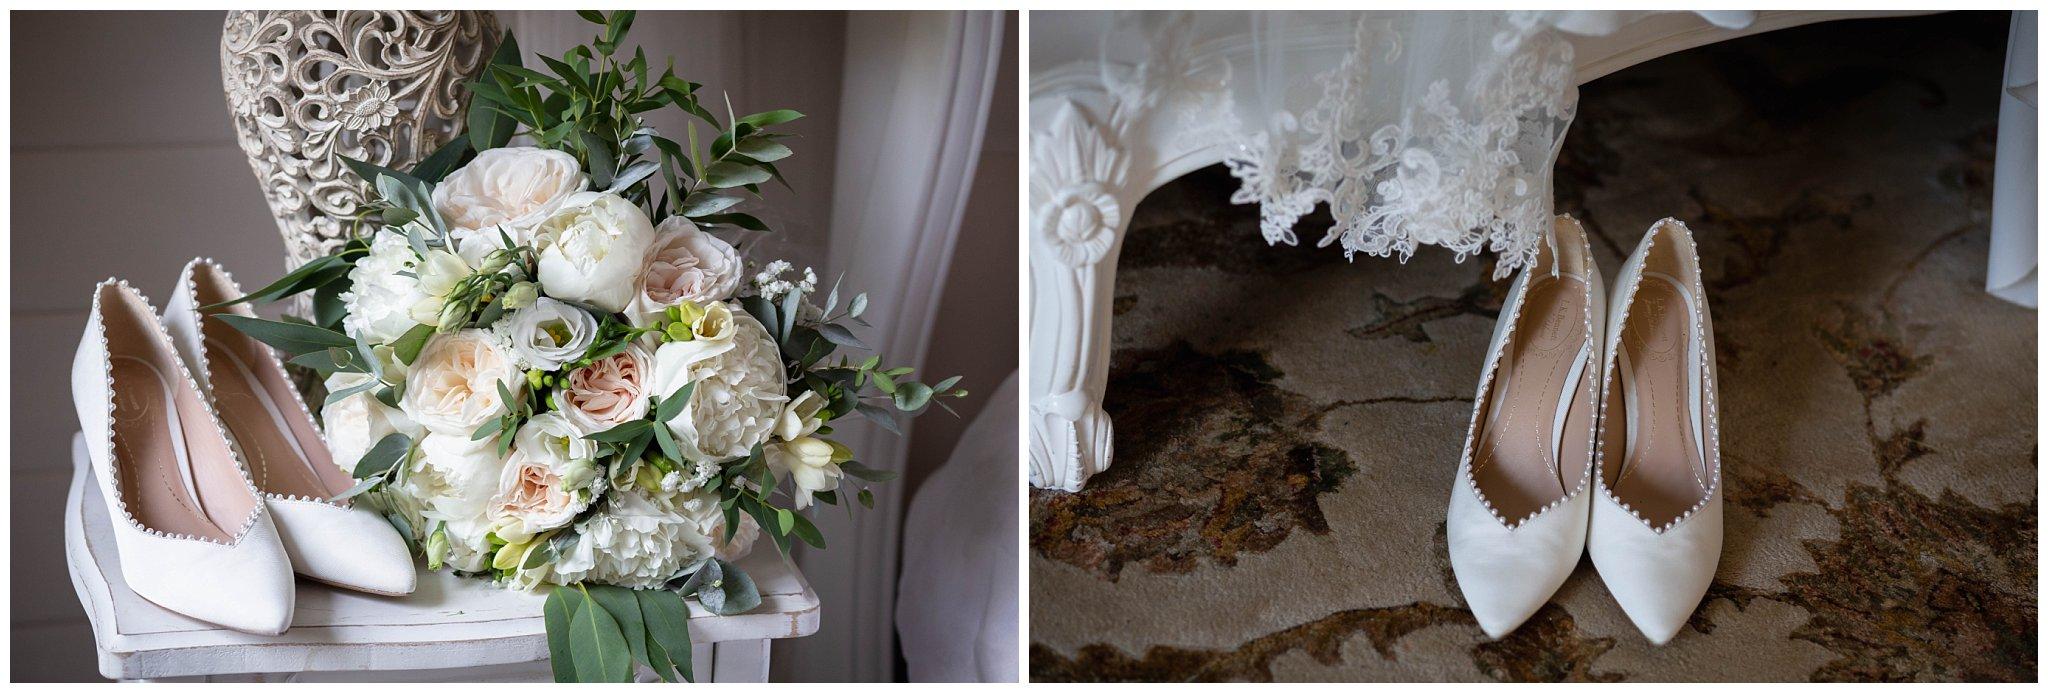 Marleybrook House Canterbury wedding